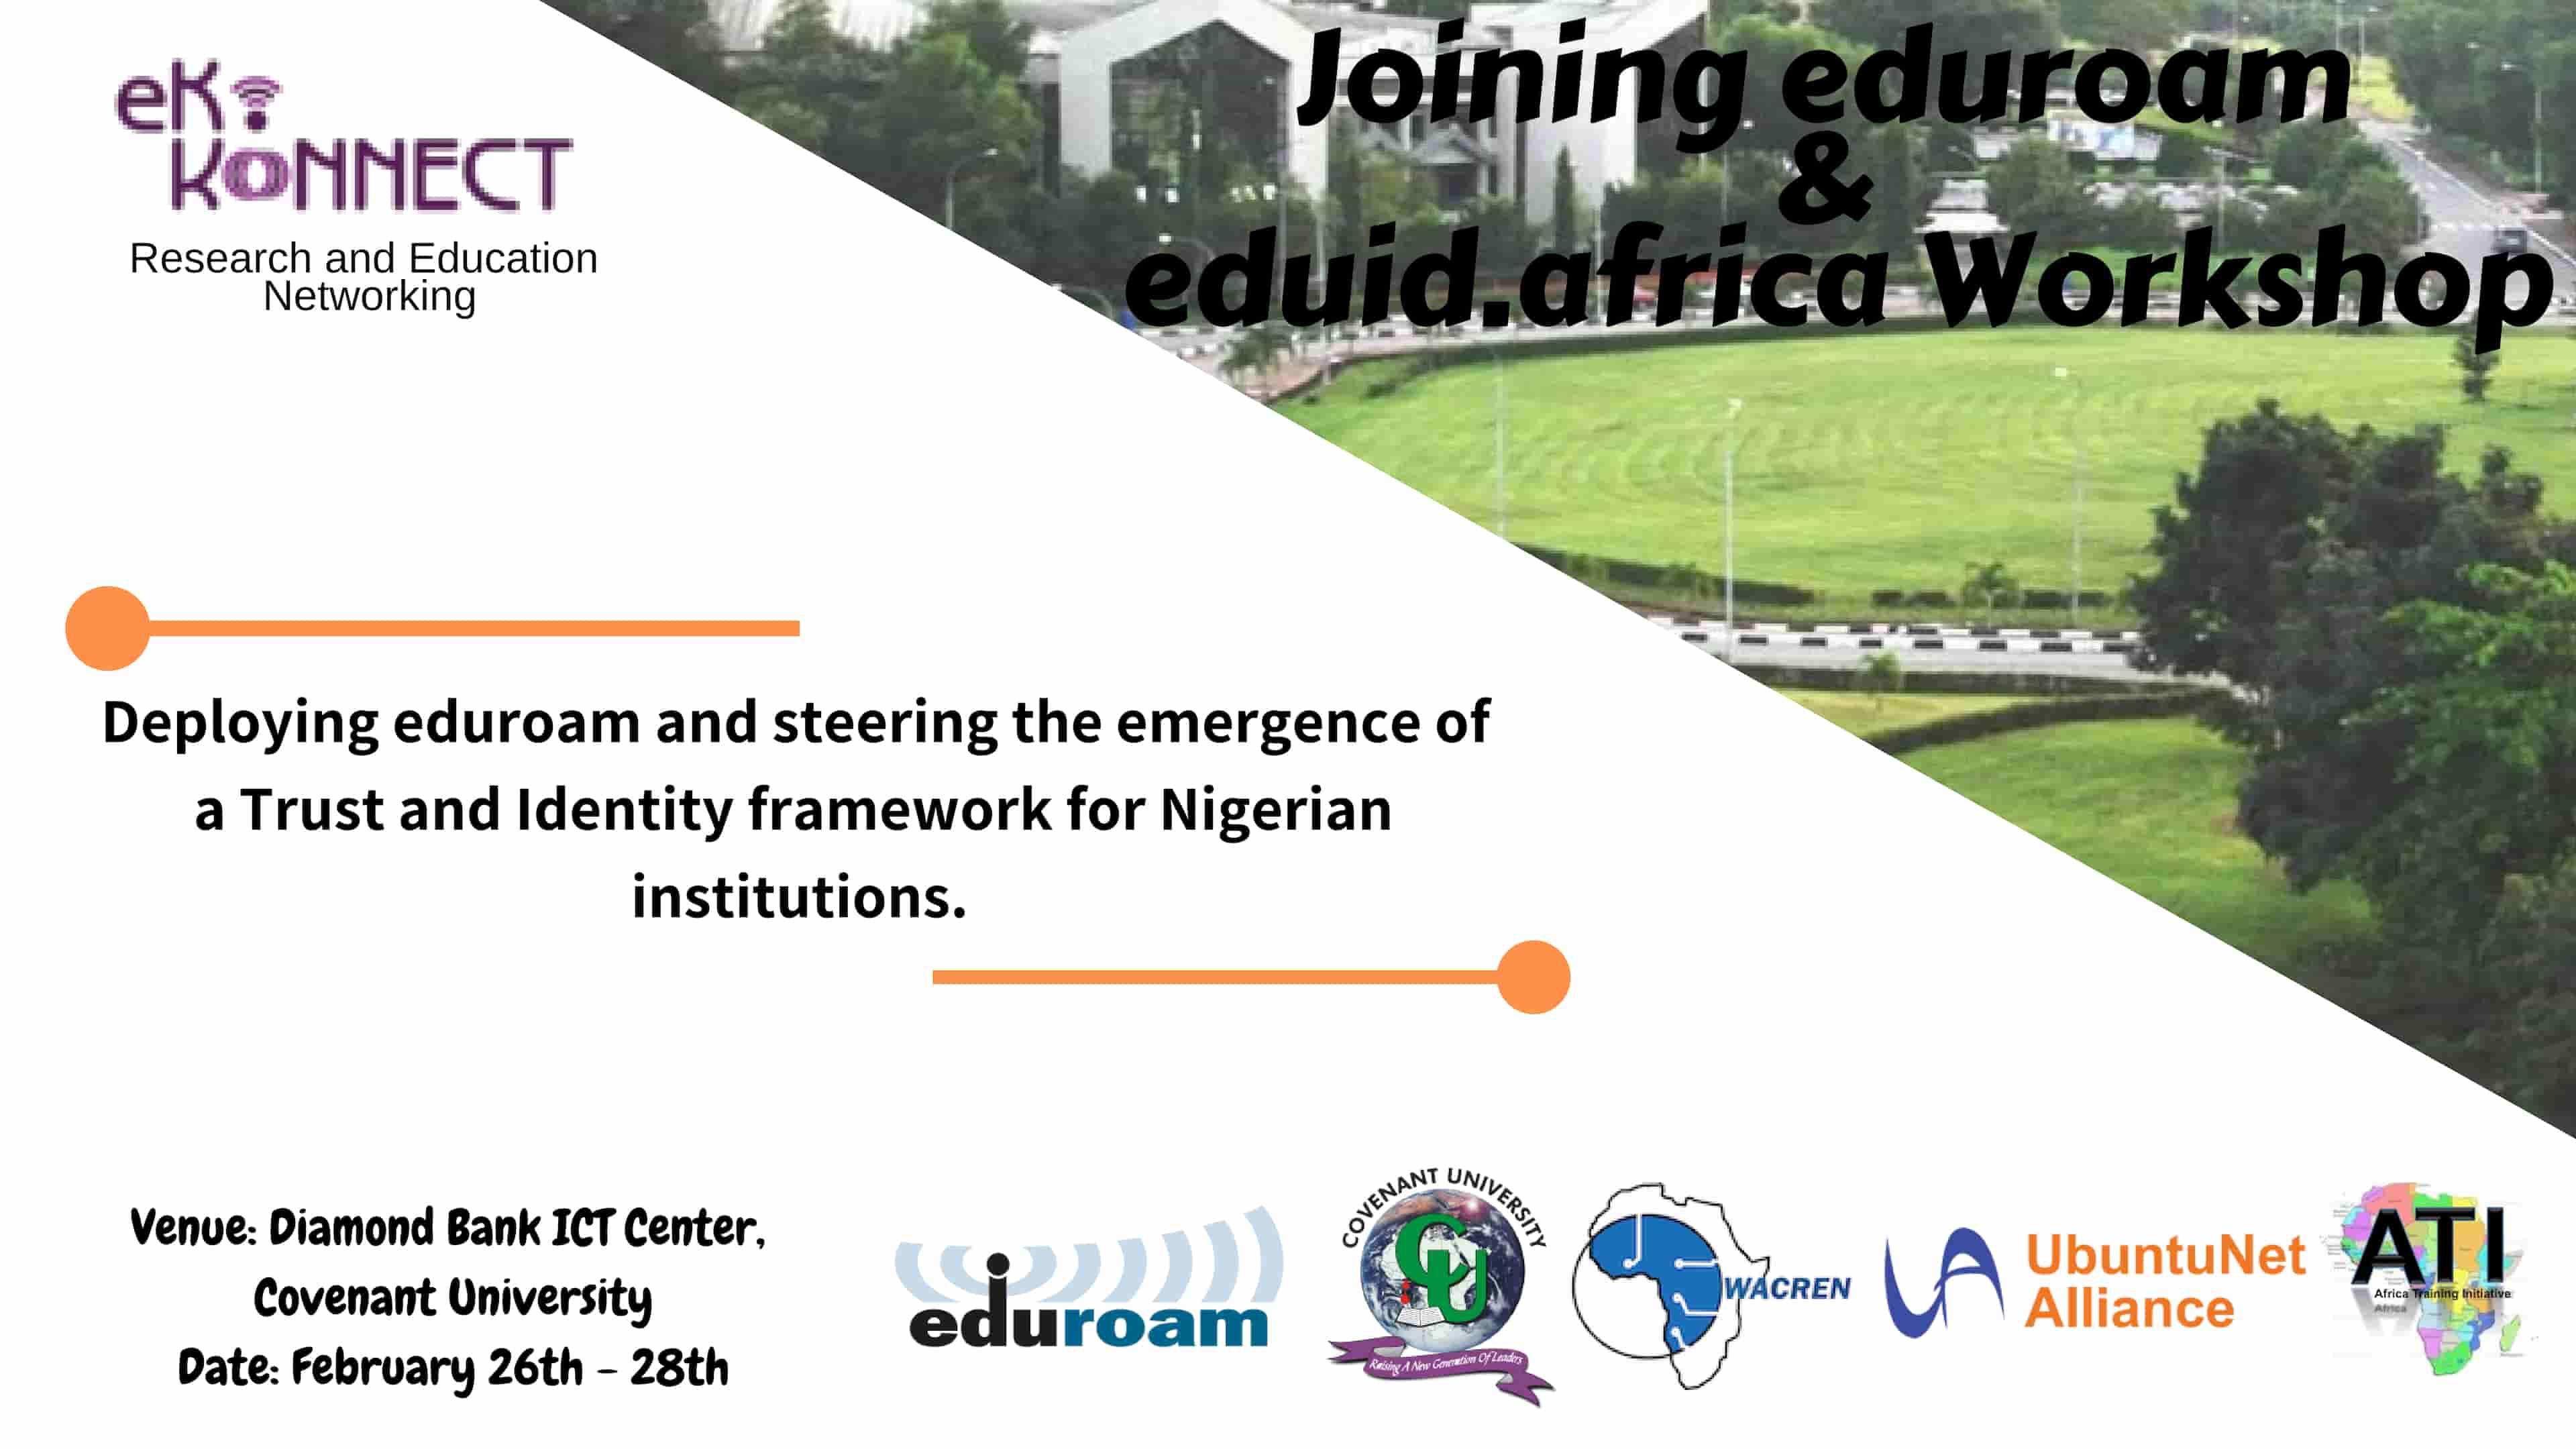 Eko-Konnect to Host ATI-6 Workshop on Joining eduroam and eduid.africa